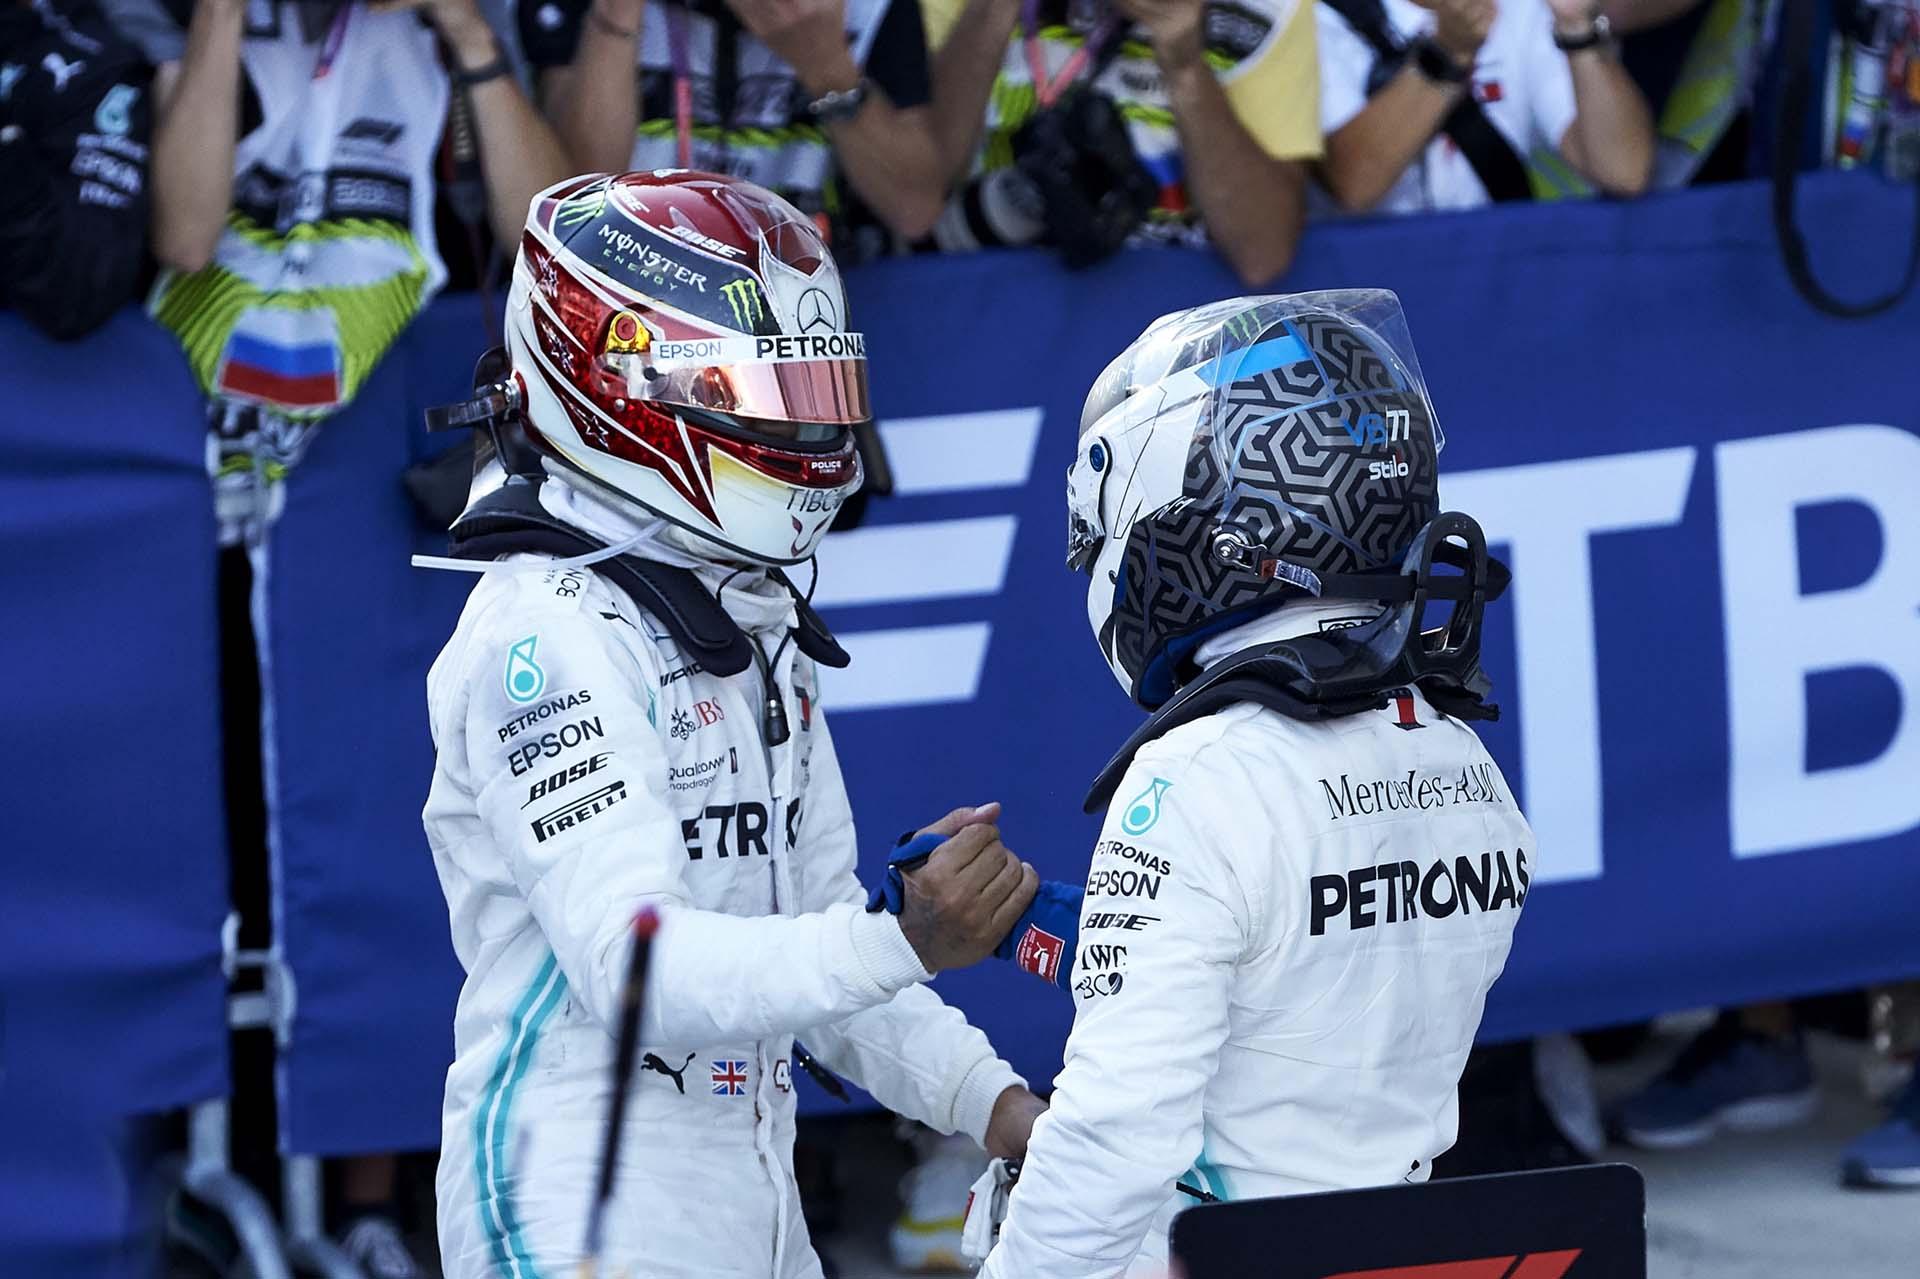 2019 Russian Grand Prix, Sunday - Steve Etherington